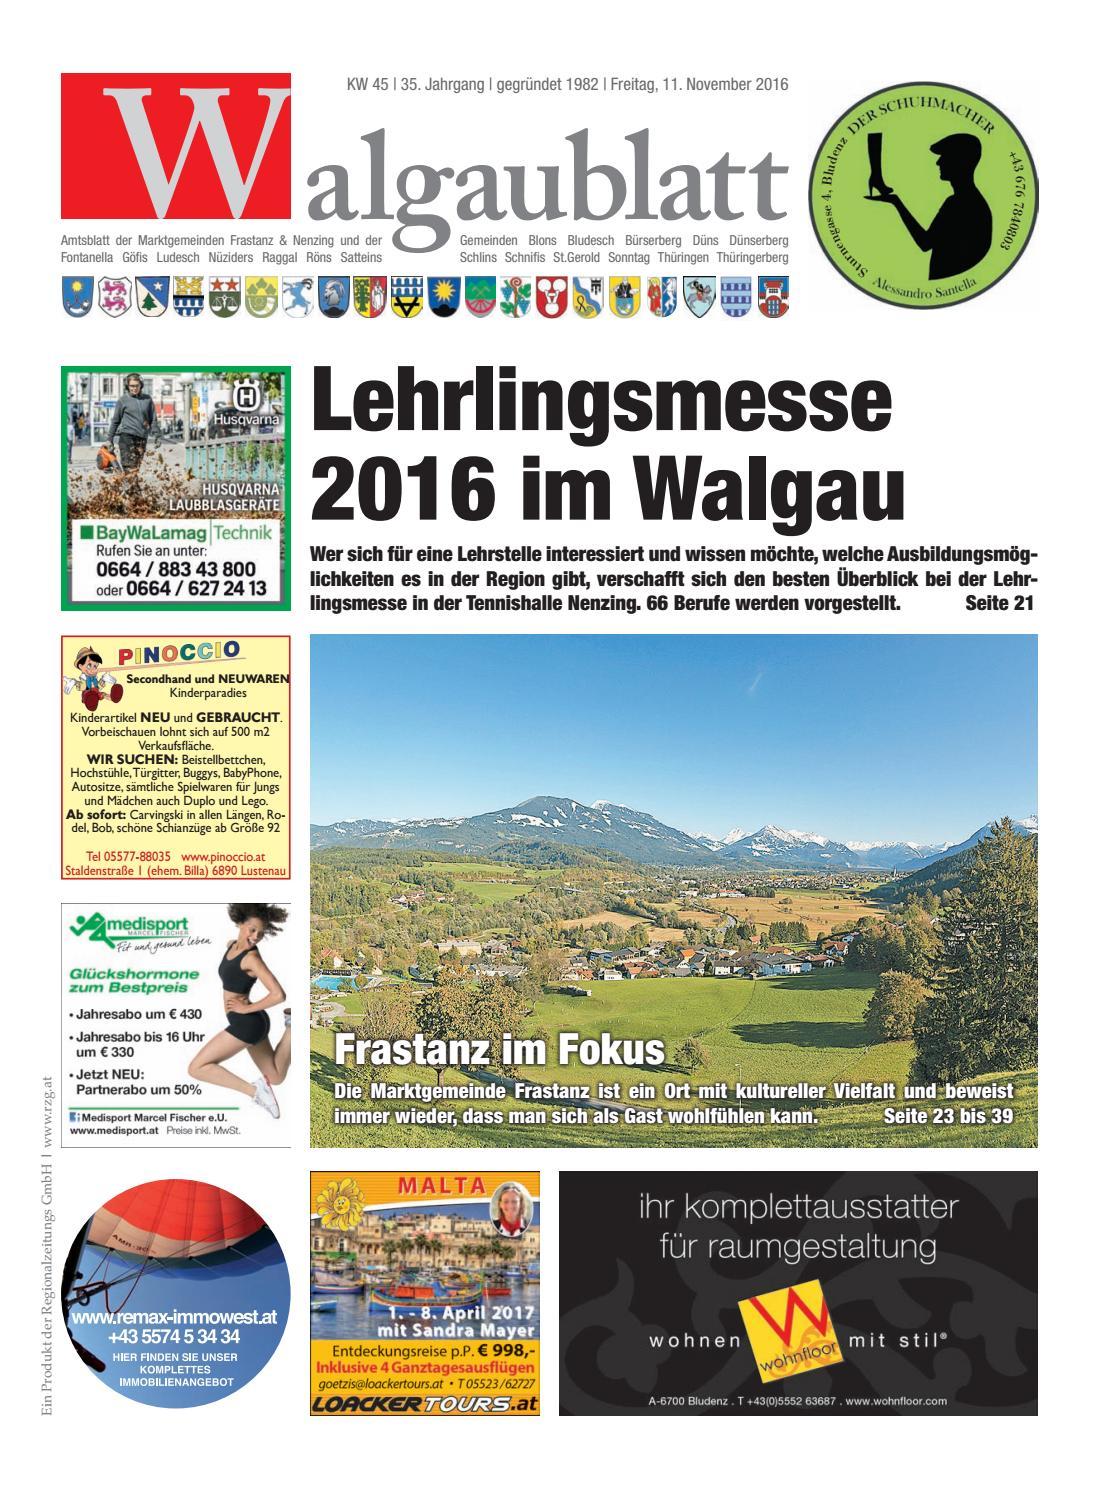 Walgaublatt 45 by Regionalzeitungs GmbH - issuu